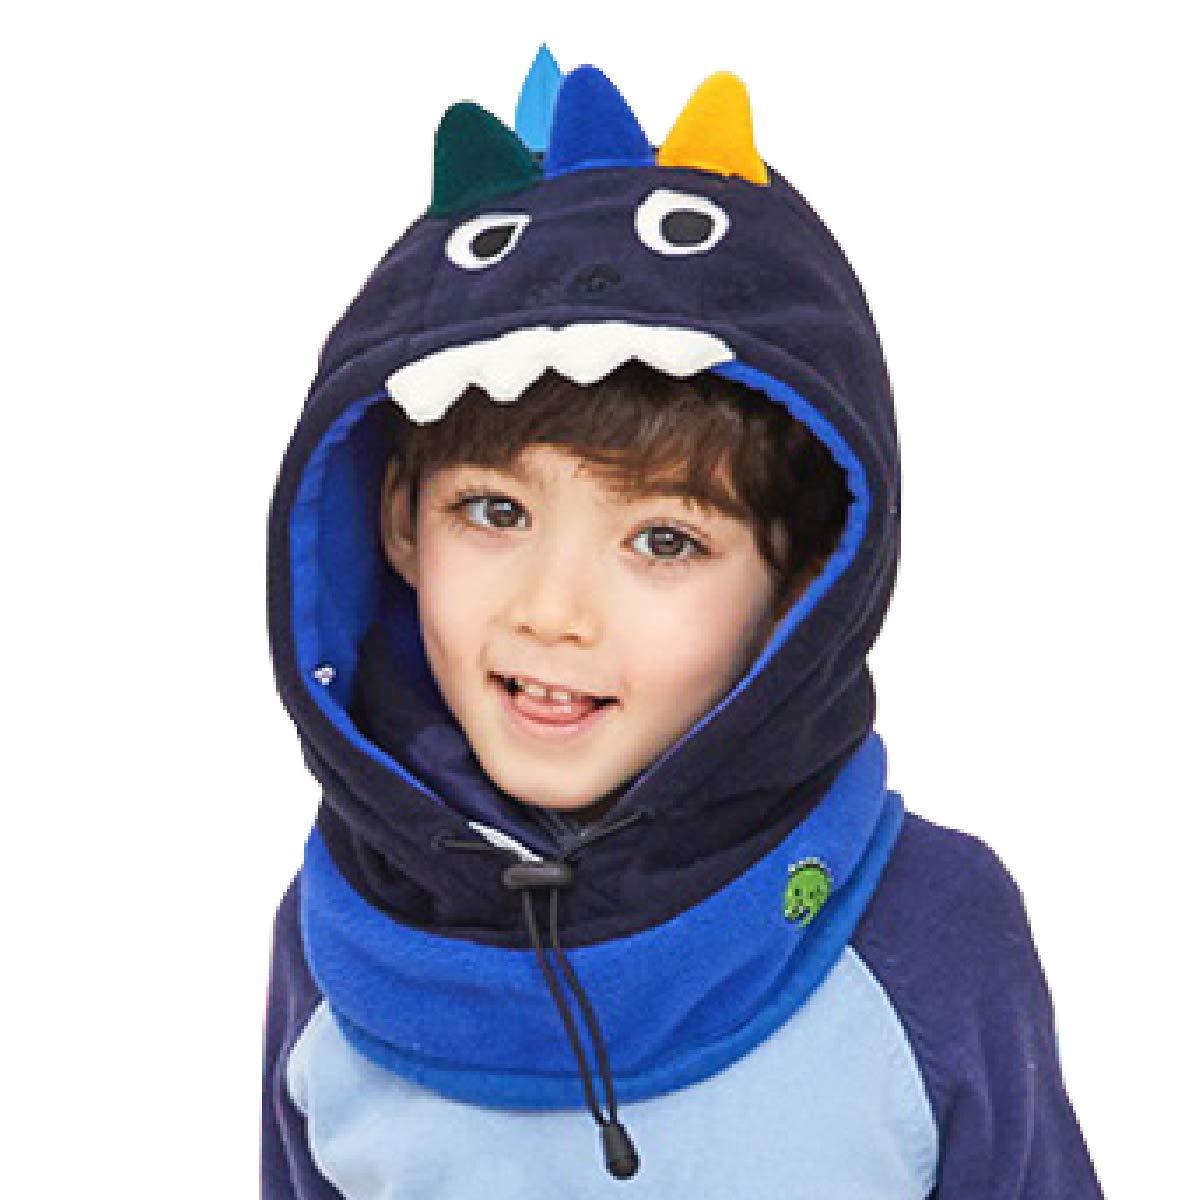 TRIWONDER Kids Balaclava Face Mask Fleece Ski Mask Neck Warmer Nose Warmer Face Cover Winter Animal Hood Hat for Boys Girls (Navy Blue - Dinosaur)